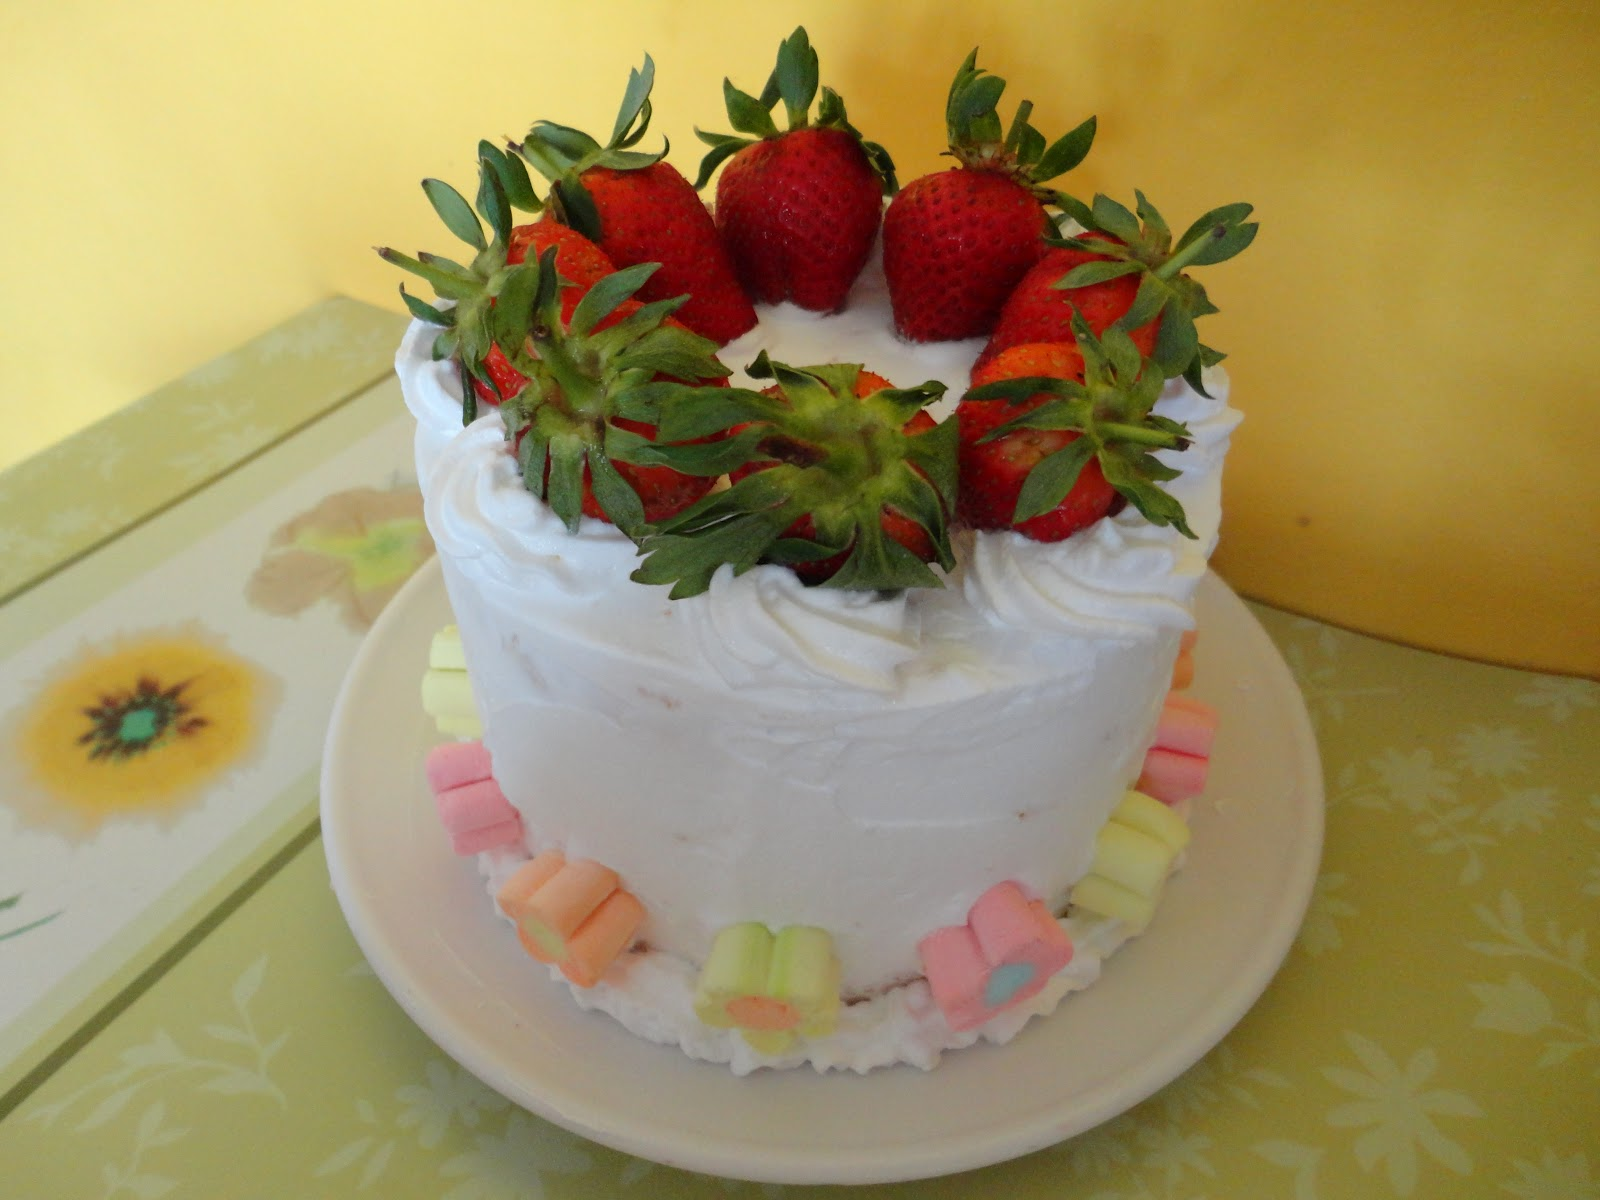 Homemade Birthday Cake Ideas For Boyfriend Perfectend for